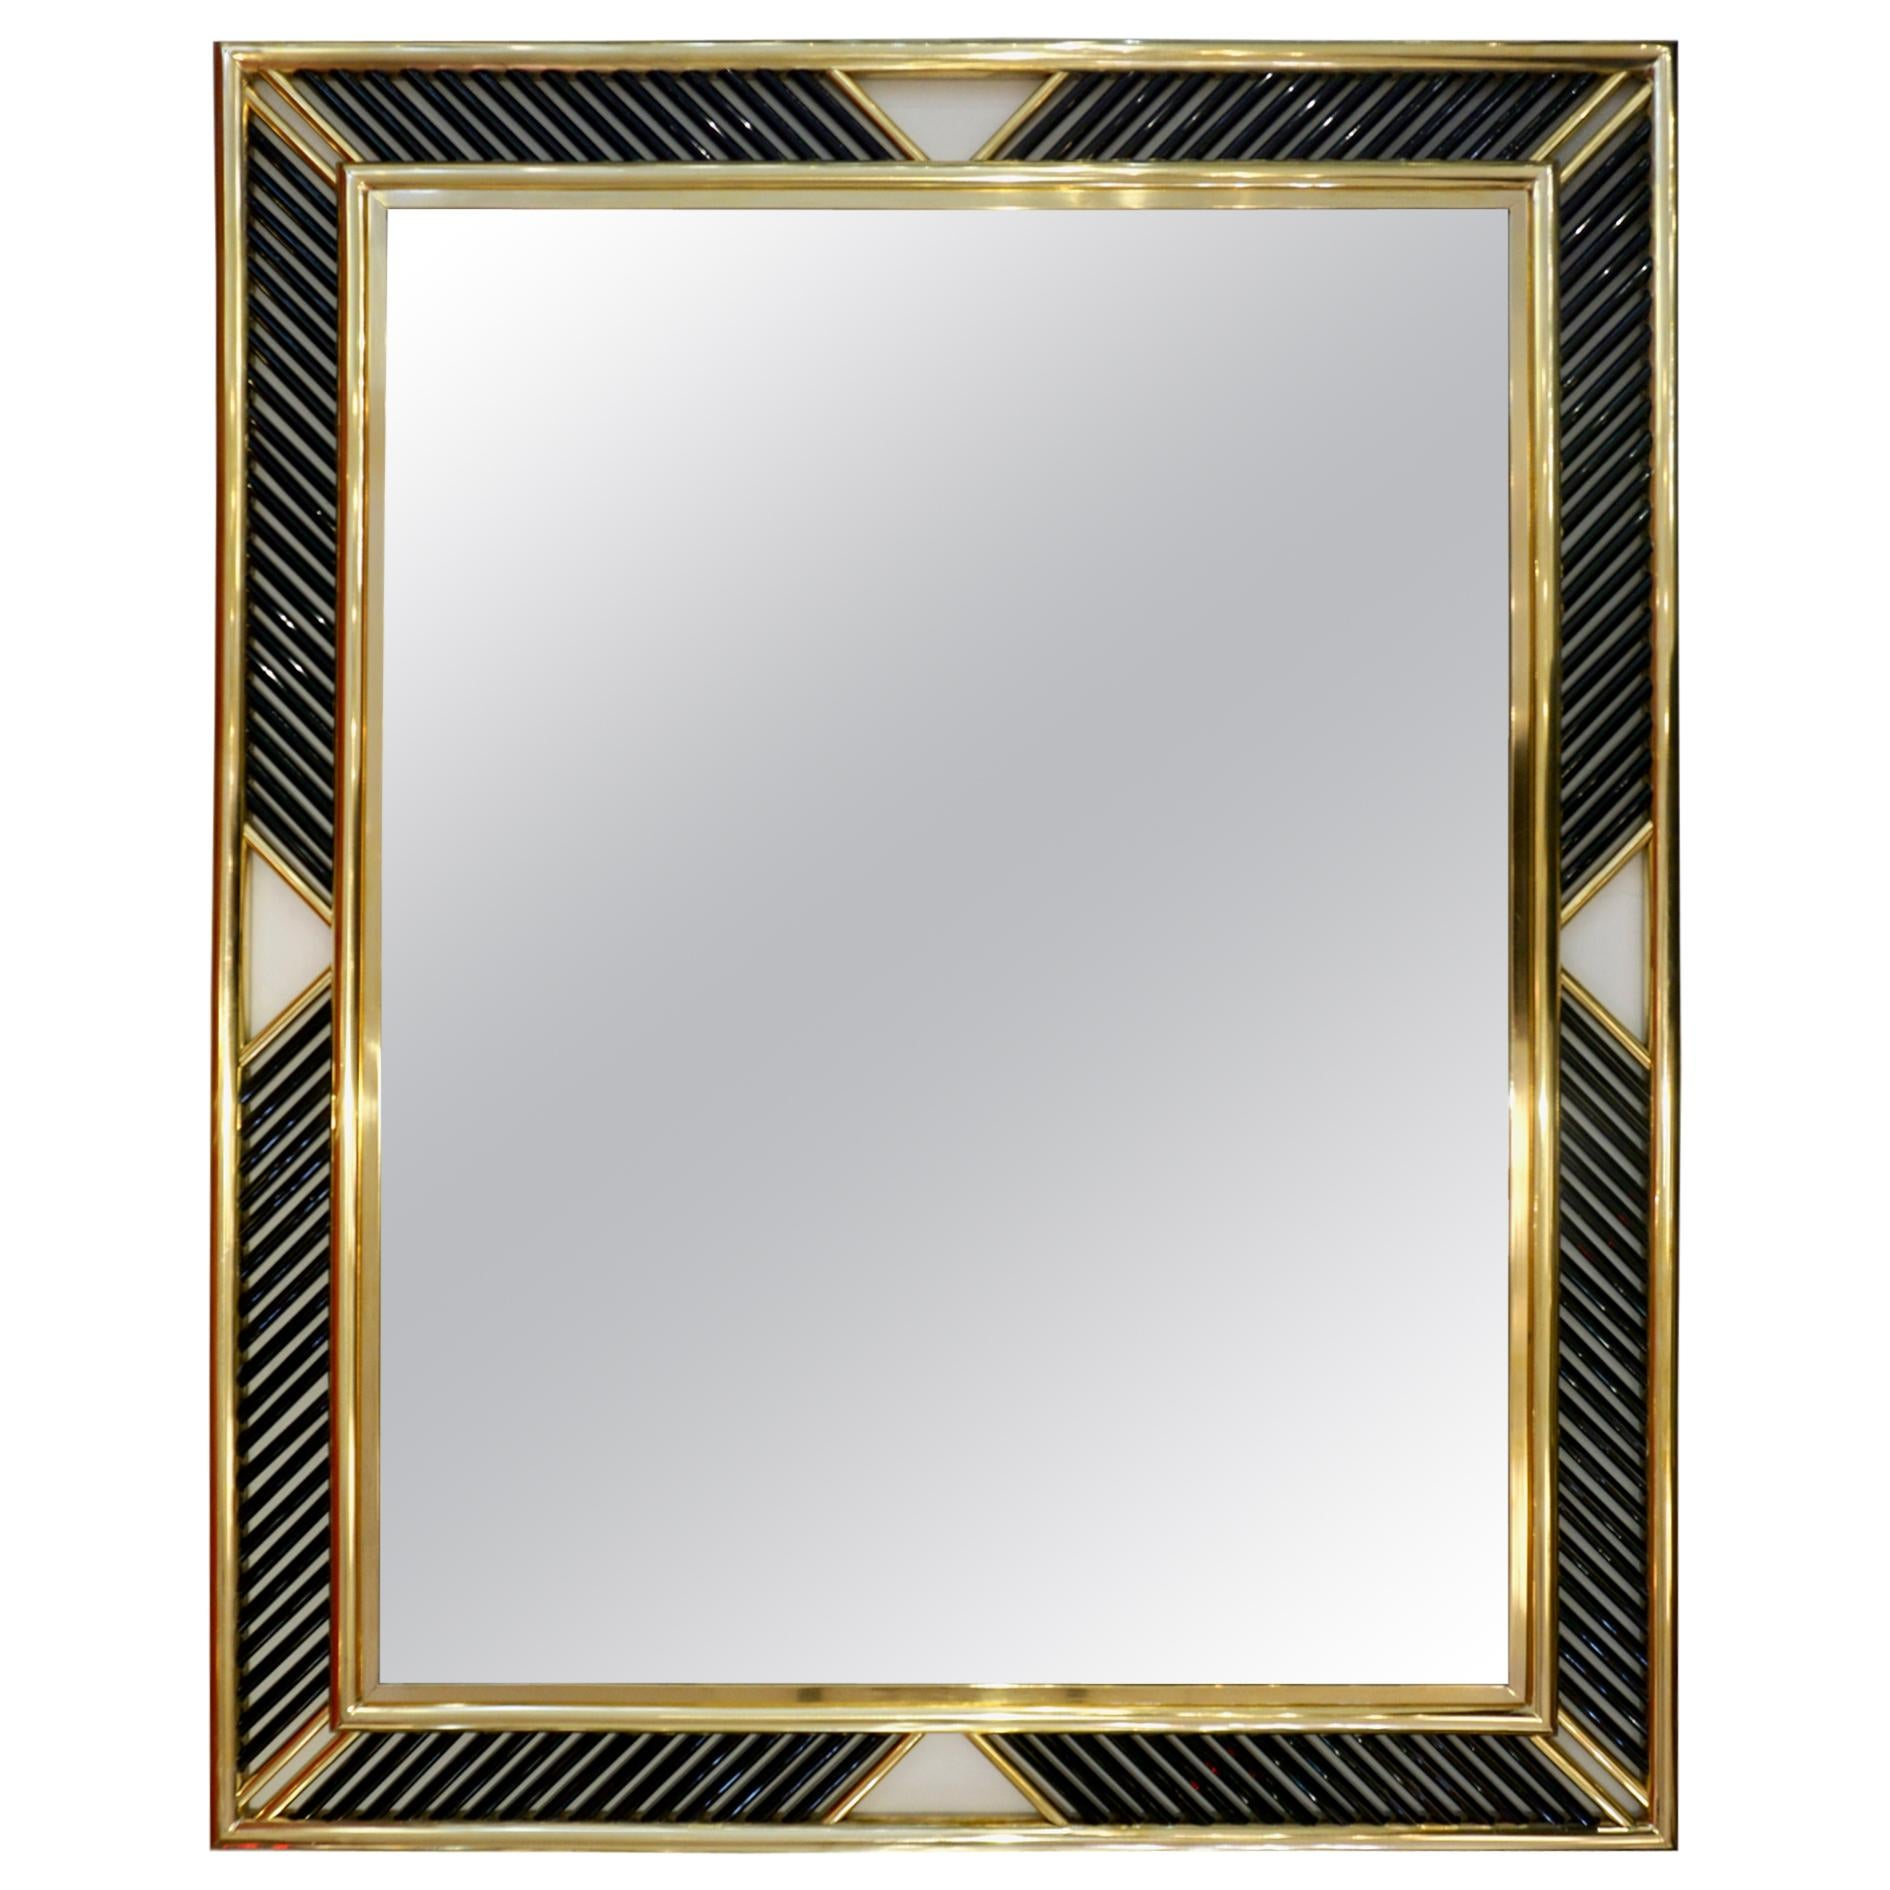 Italian Regency Modern Nickel Geometric Mirror with Black Murano Glass Baguettes